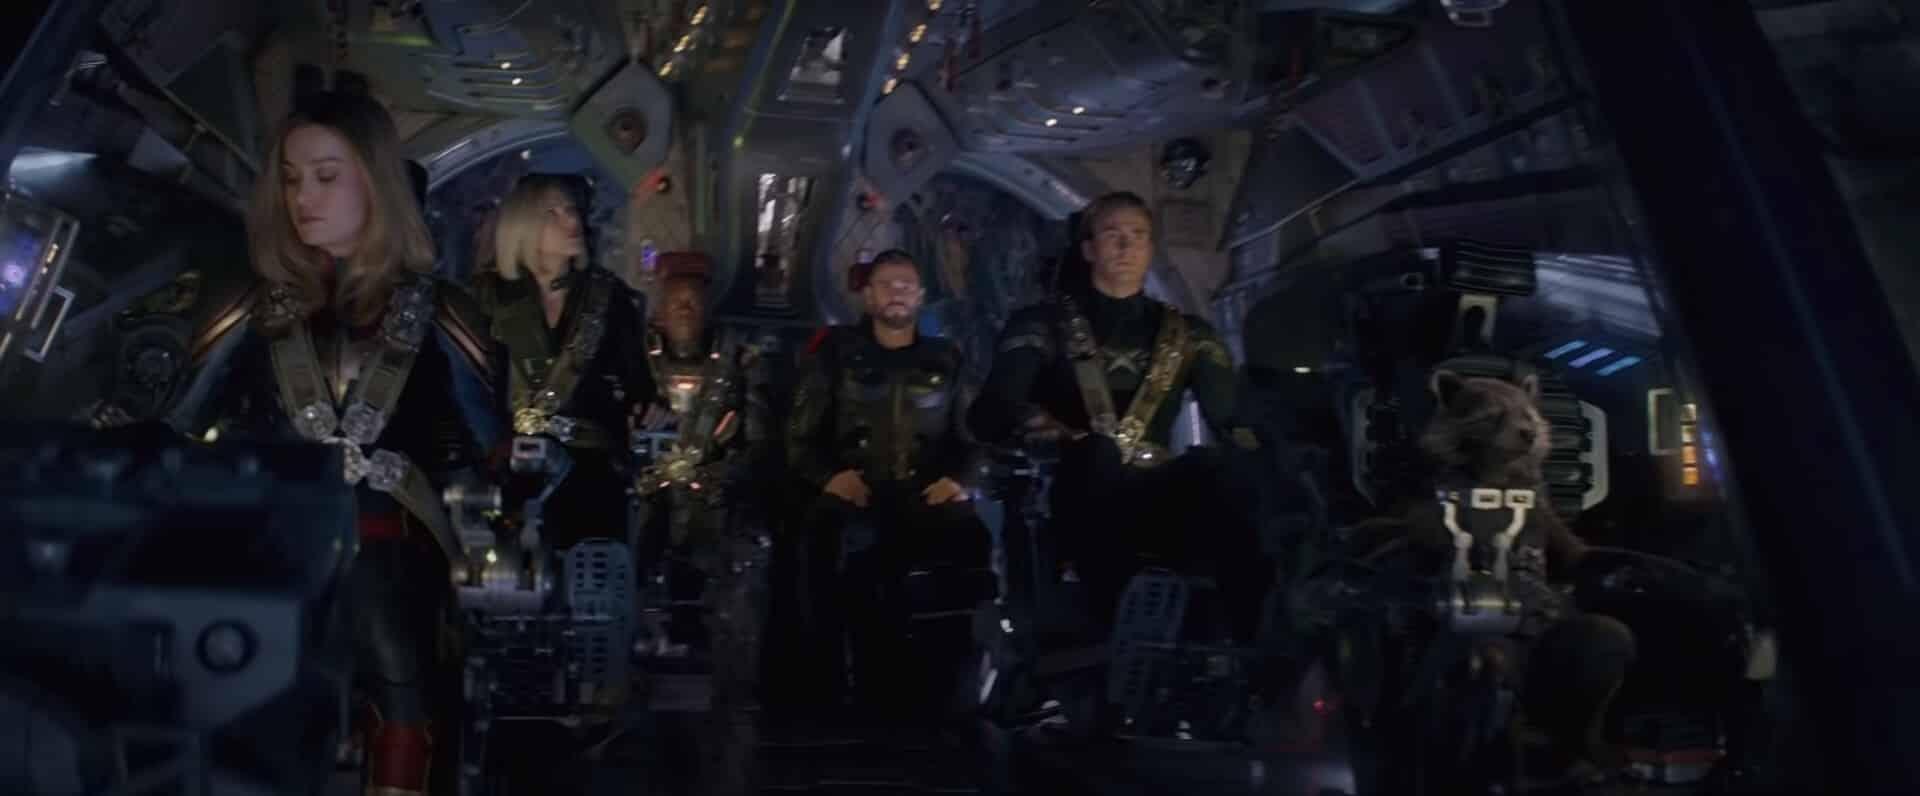 Avengers: Endgame Space Trip